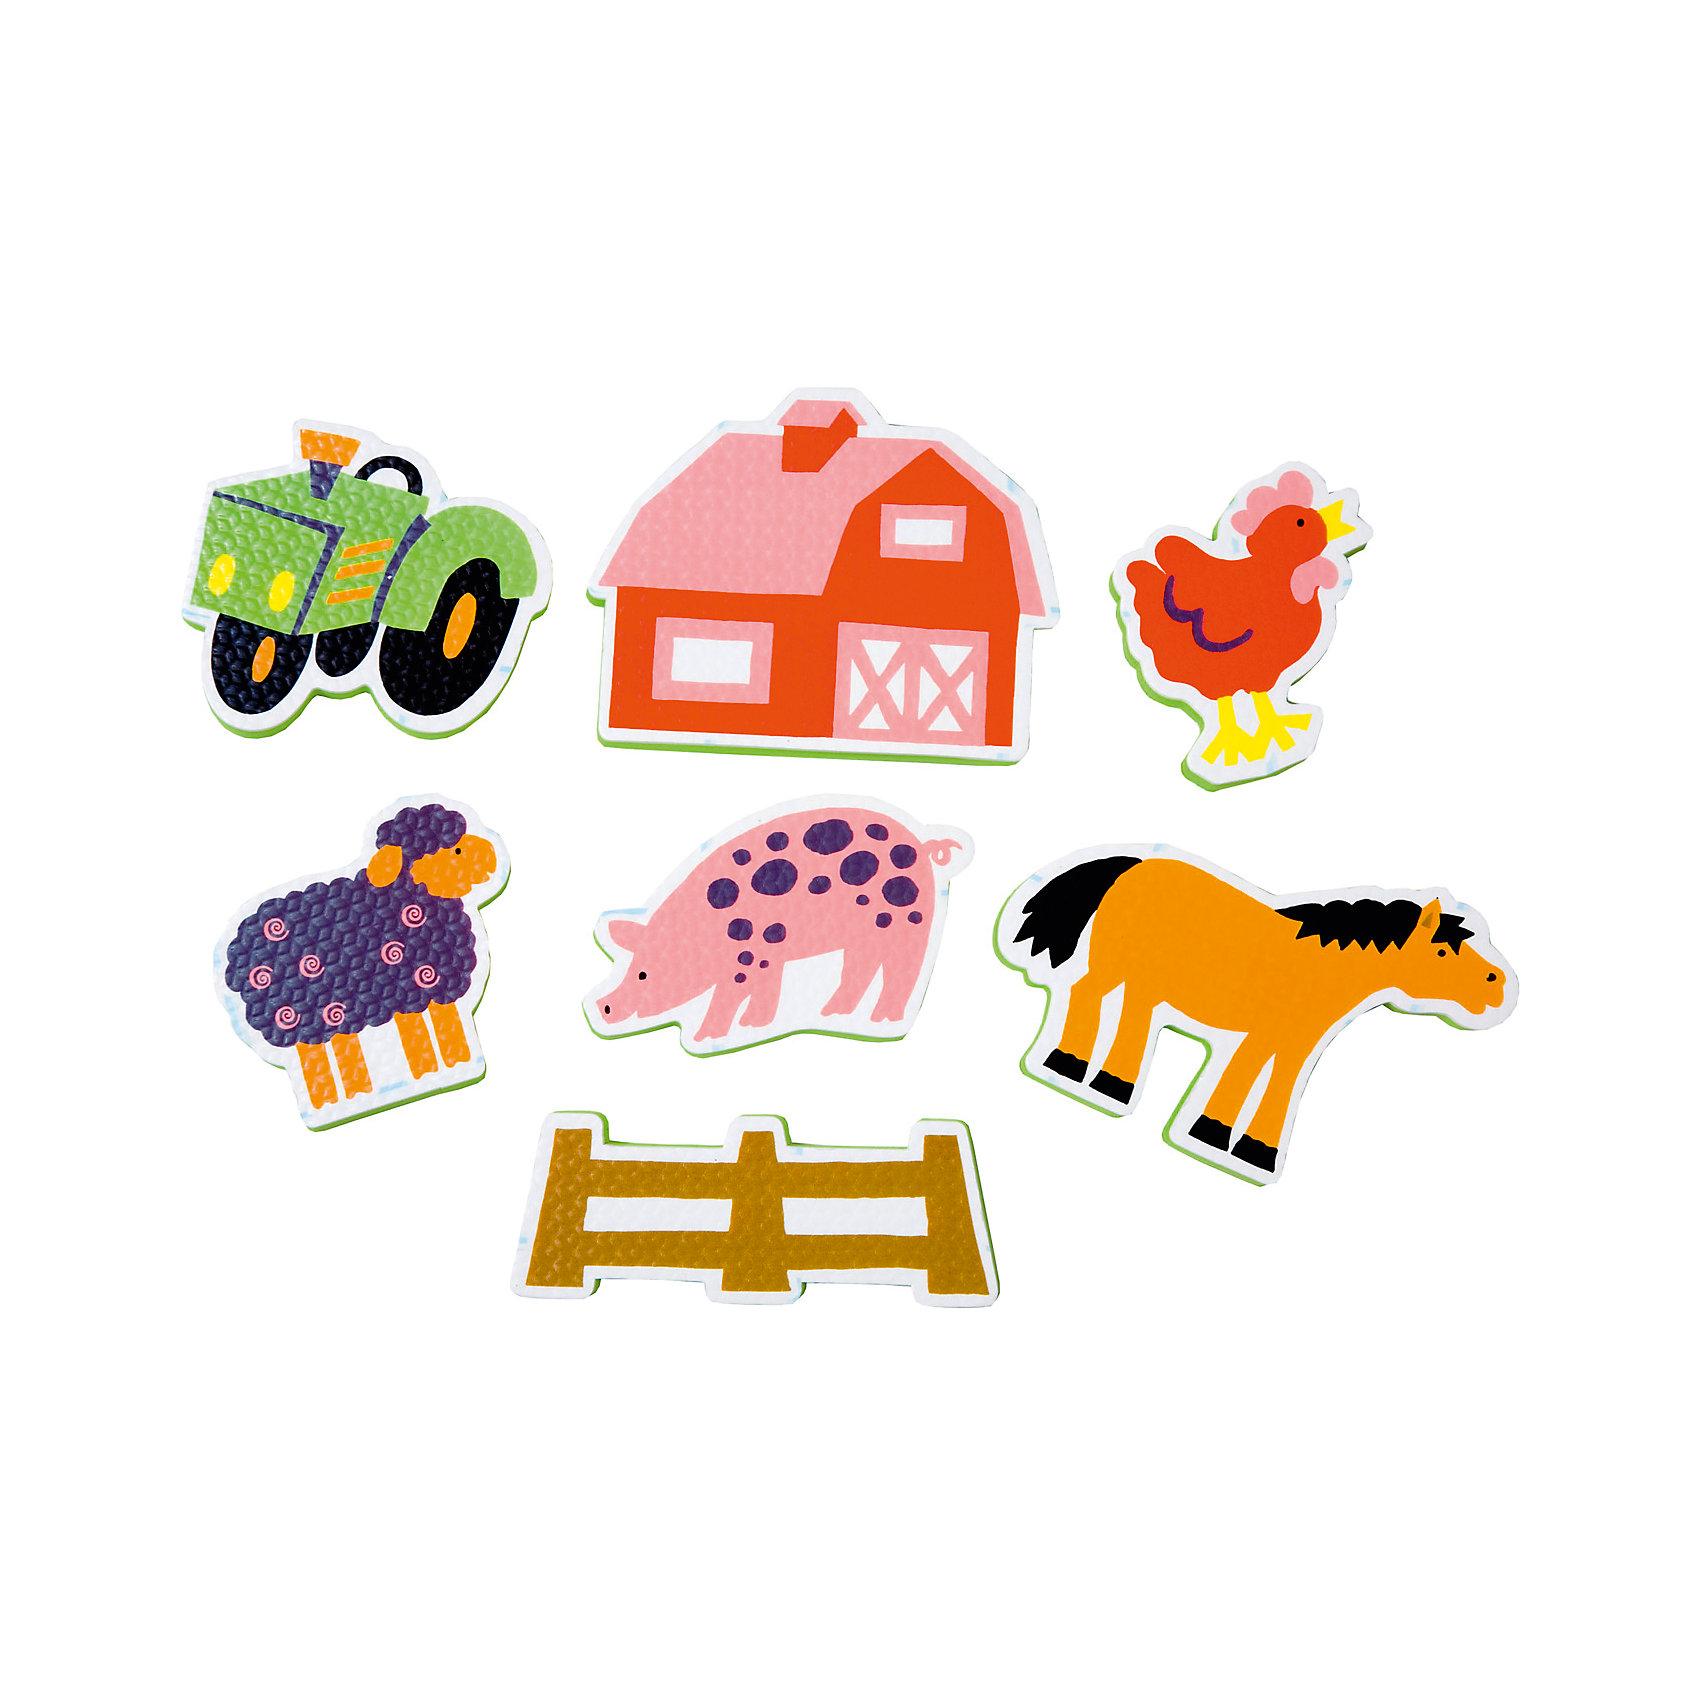 ALEX Набор фигурок-стикеров для ванны Ферма в сетке, ALEX alex игрушки для ванны 3 цветные лодочки